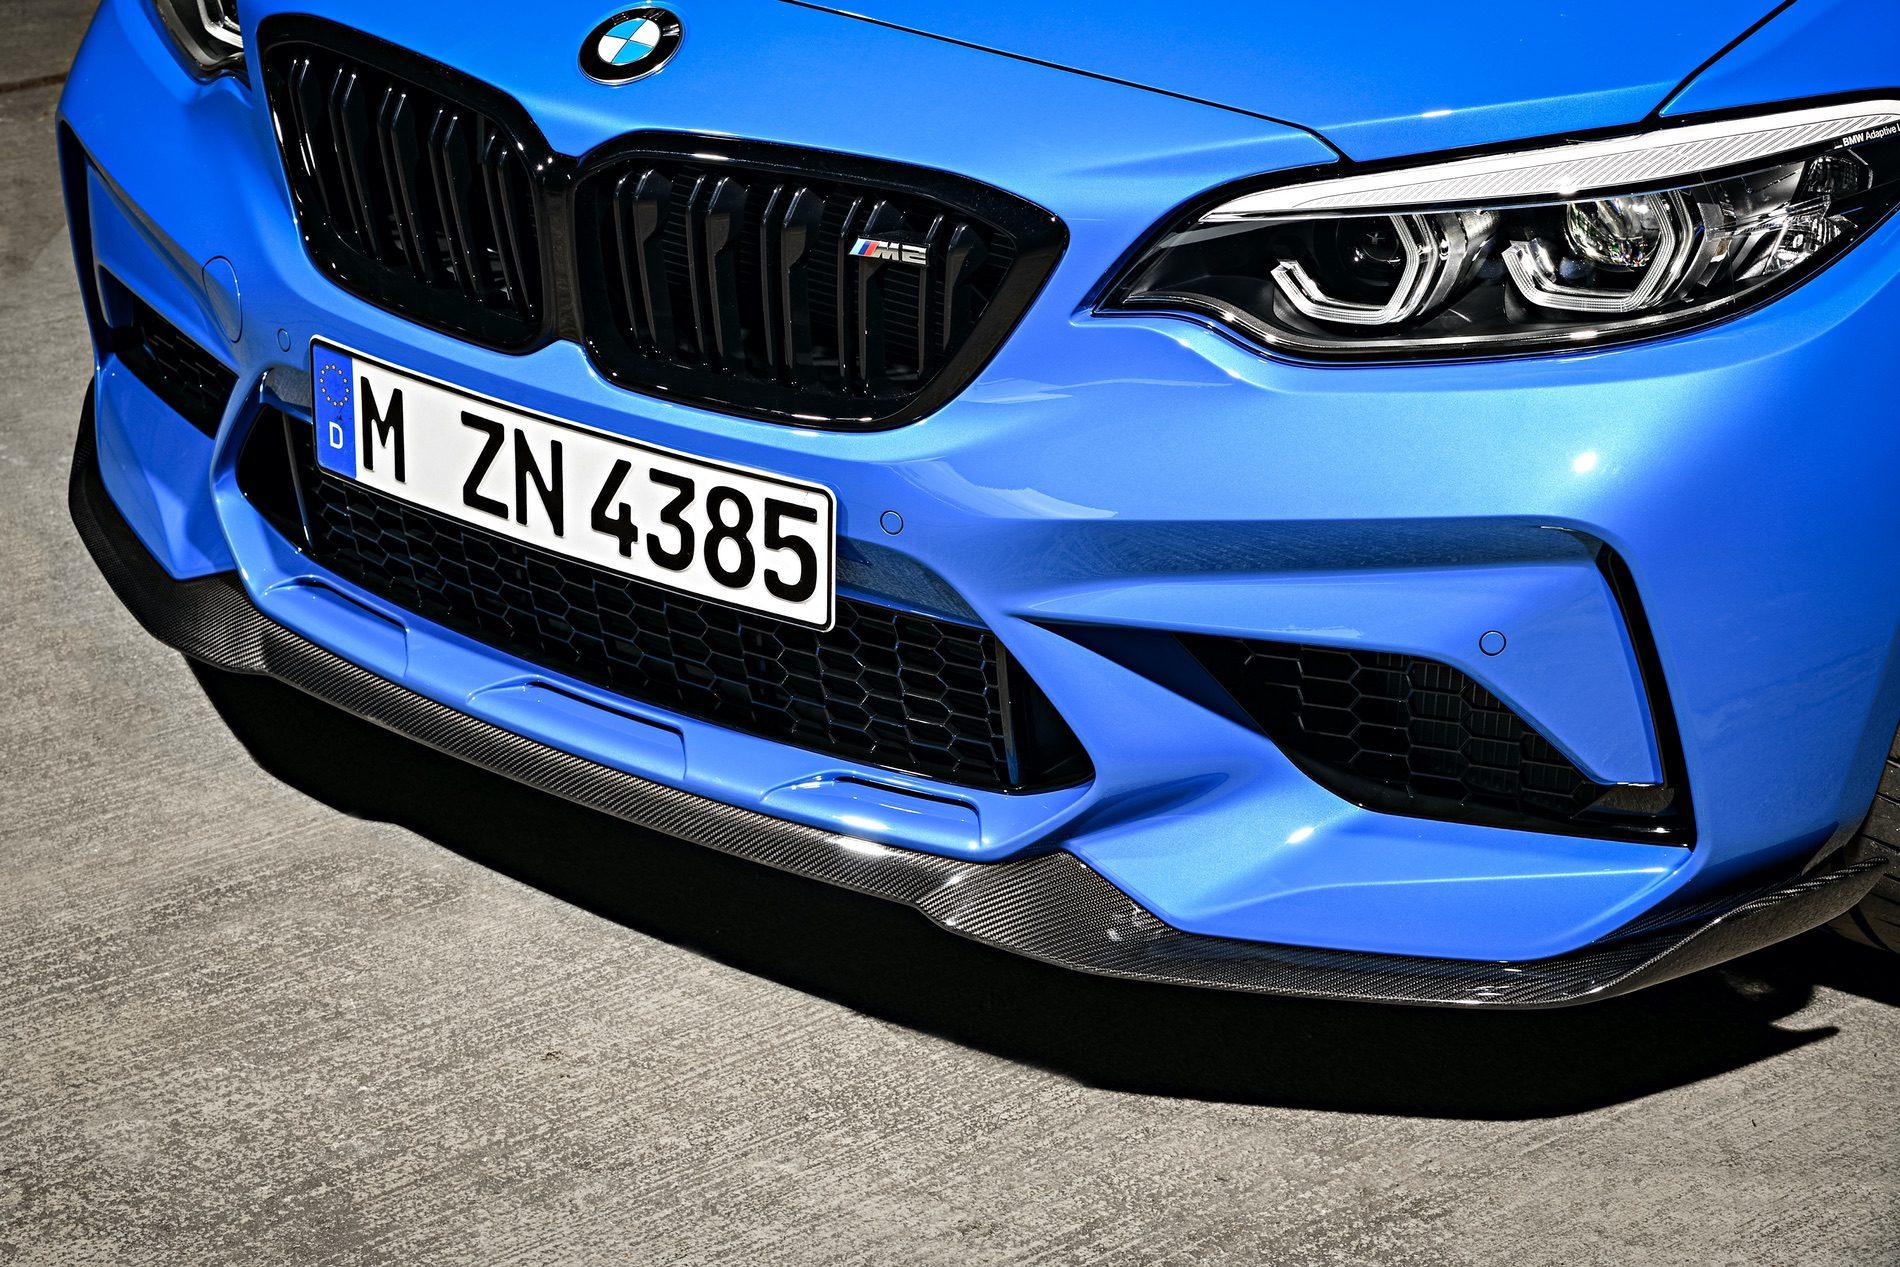 2021 BMW M2 CS Misano Blue 46